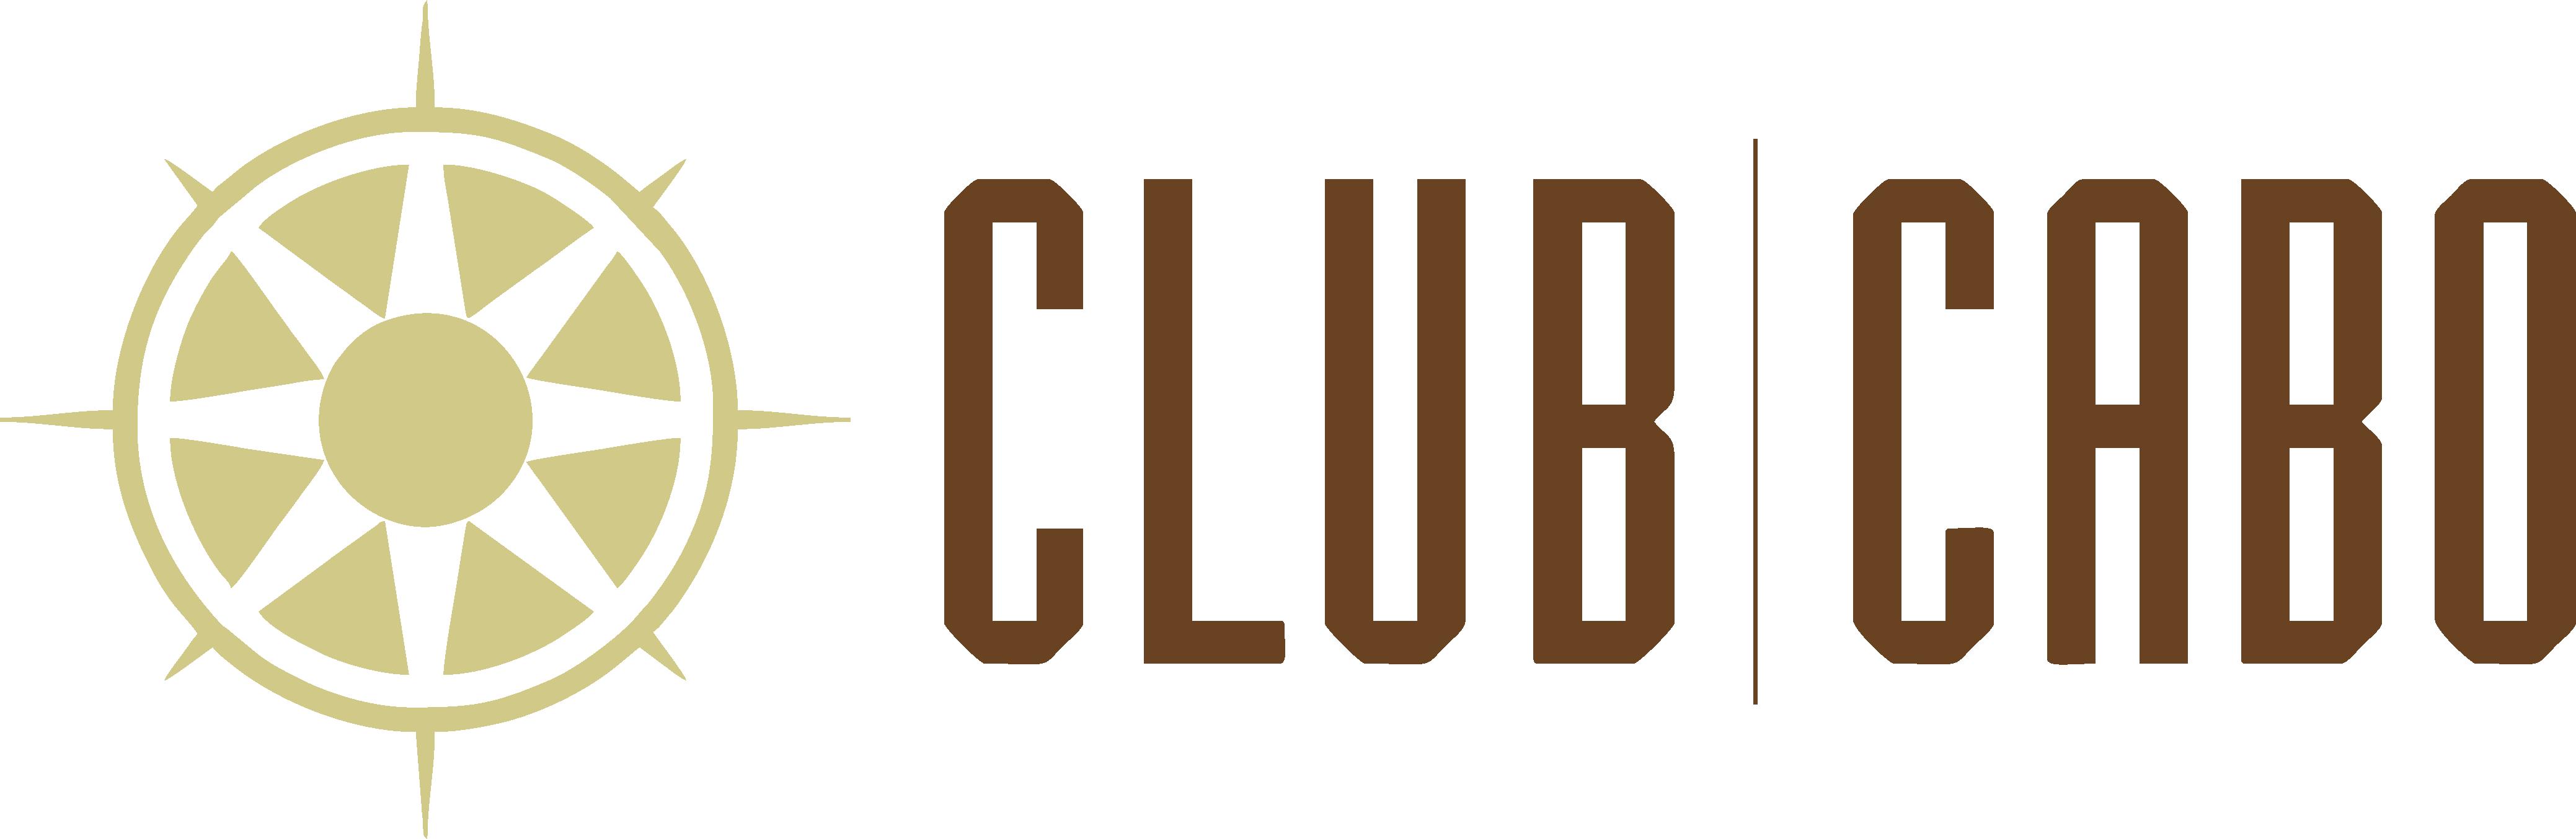 cotexsa - club cabo